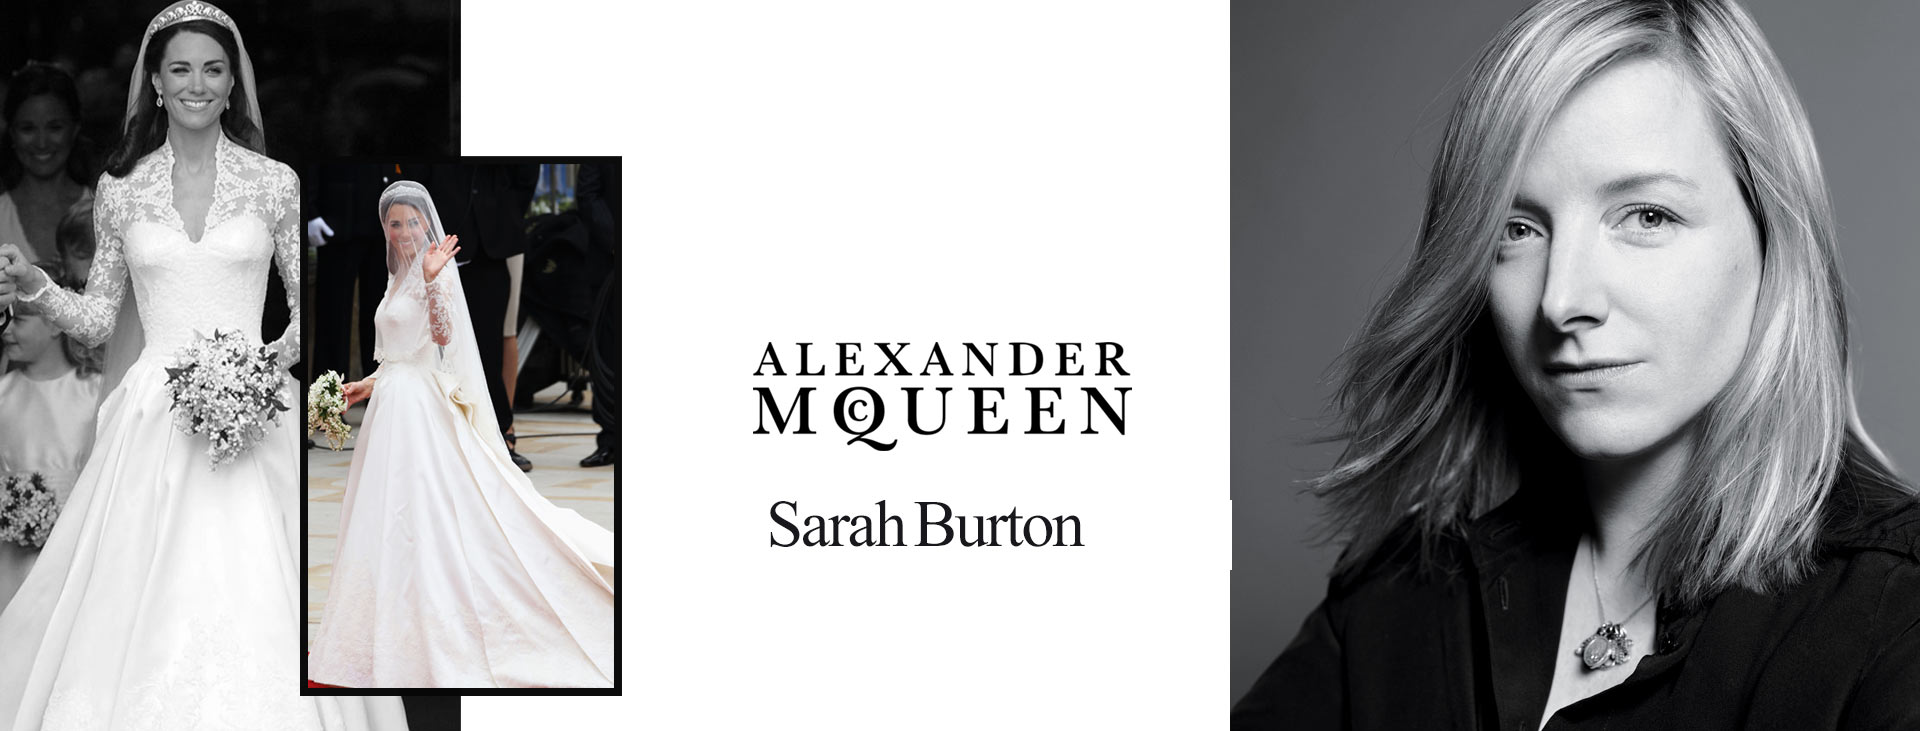 Sarah Burton 1 - زنان پیشگام در صنعت مد